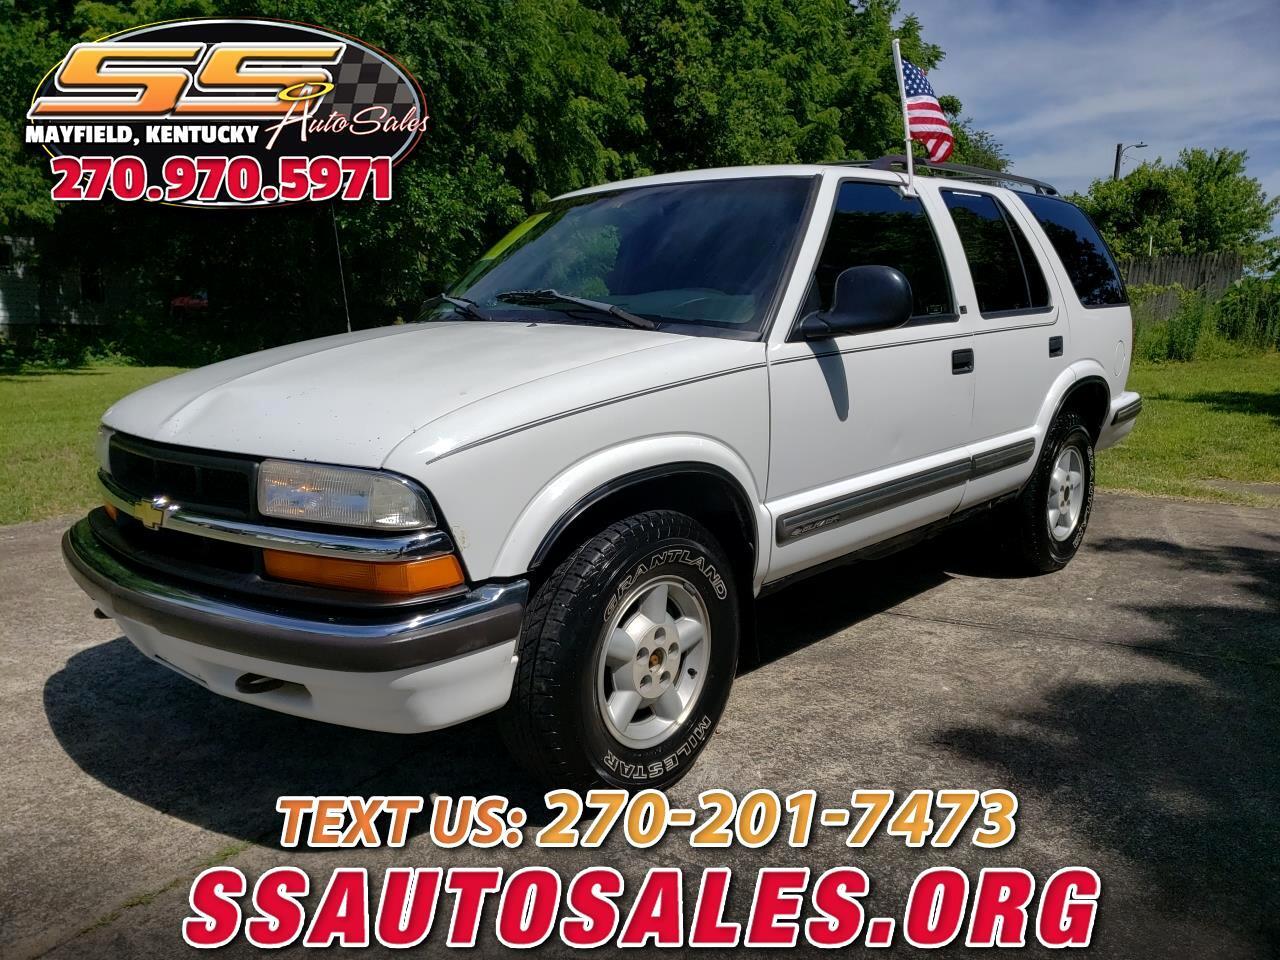 1998 Chevrolet Blazer 4dr 4WD LS